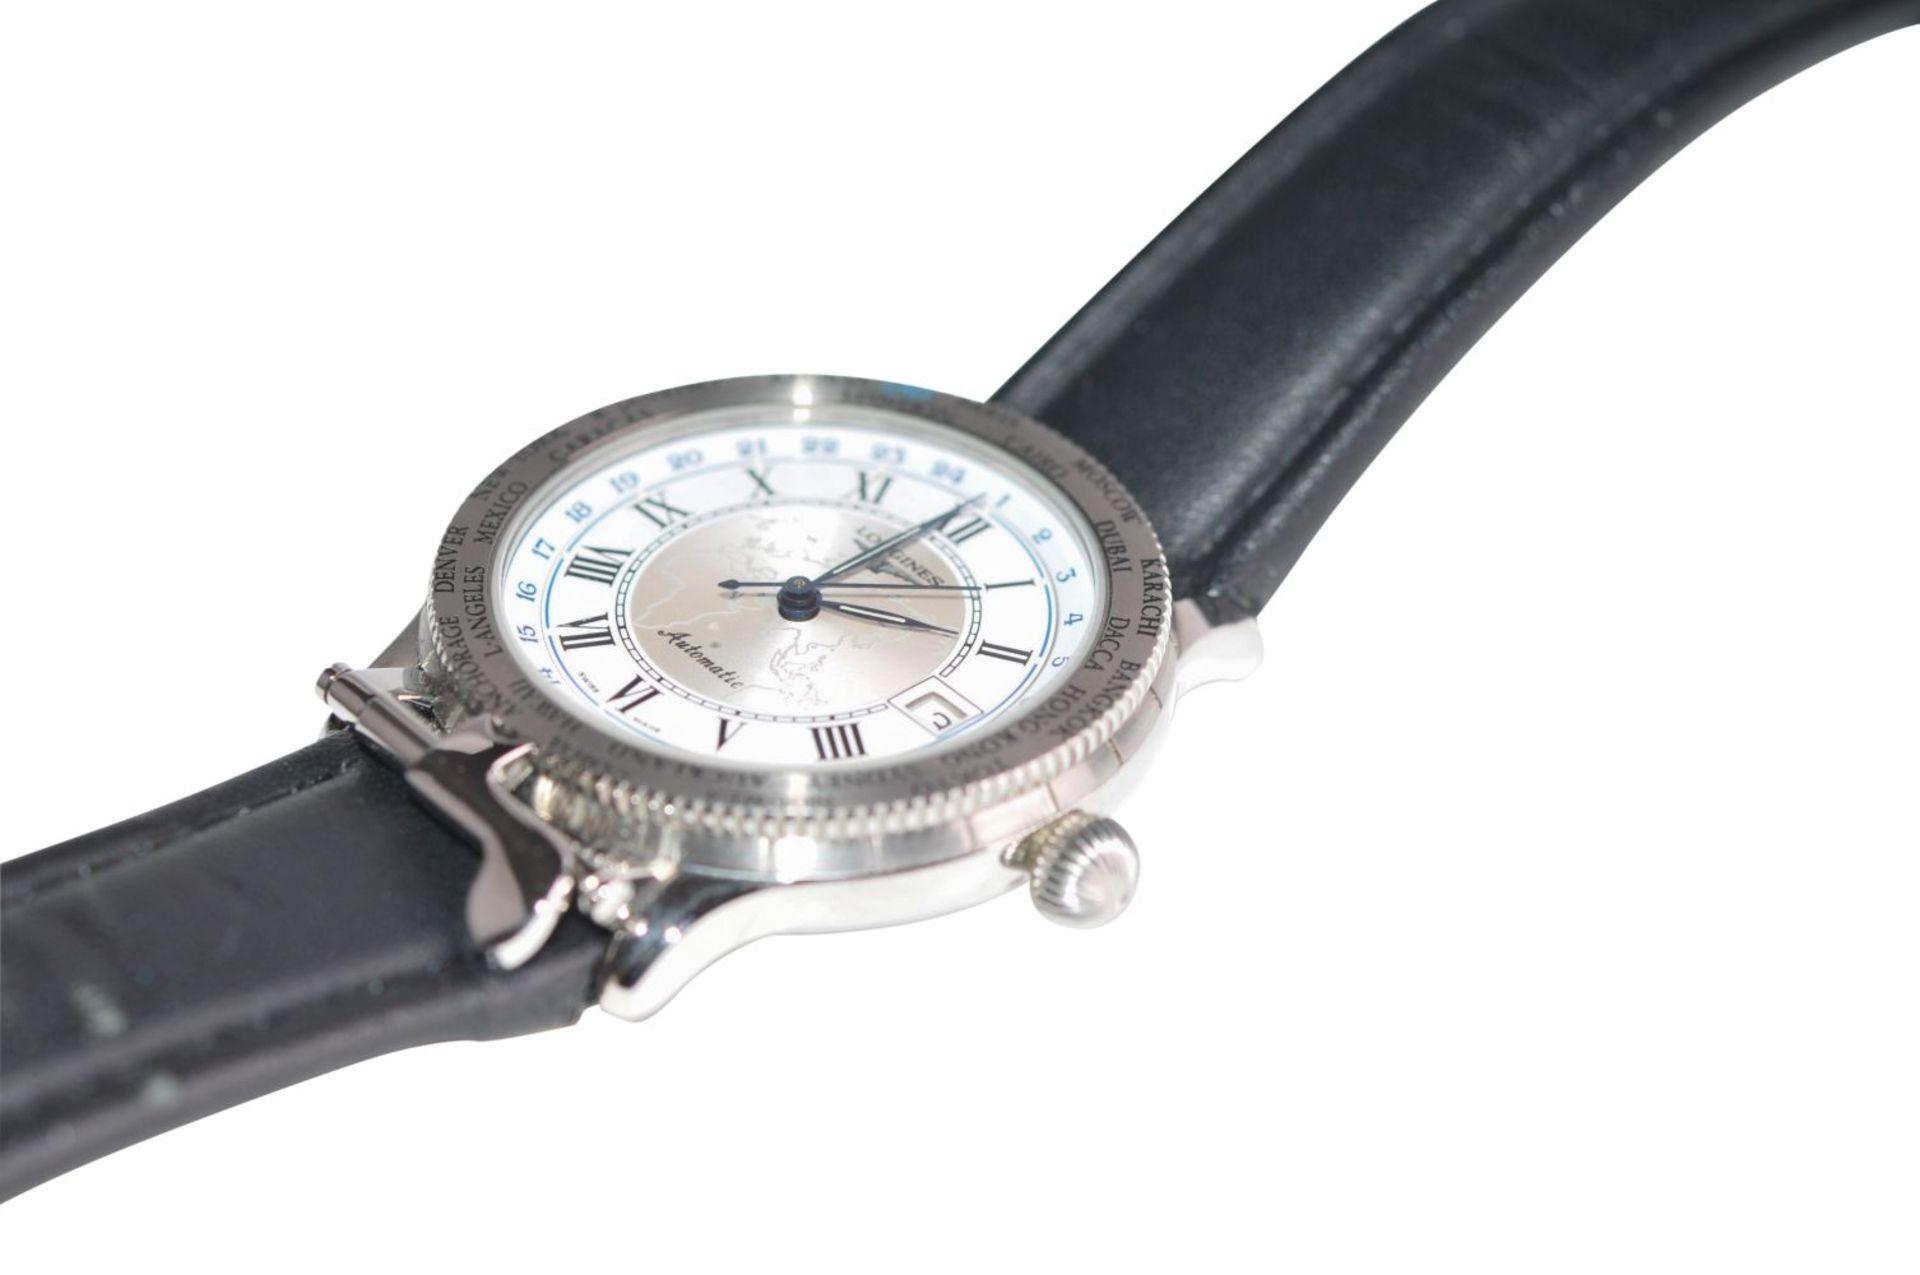 Los 45 - Longines LindberghModel: Carrera Caliber 16 Chronograph AutomaticLongines LindberghBox original &